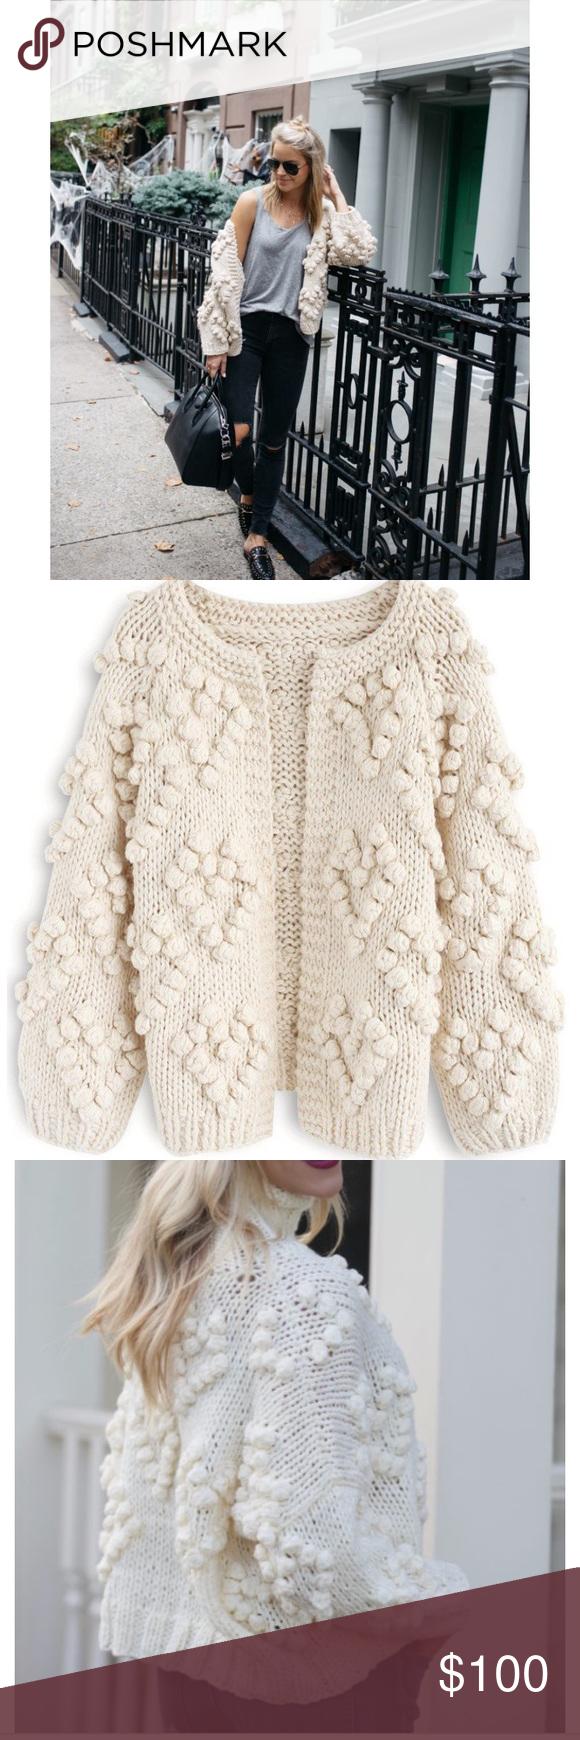 Chicwish Knit Your Love Cardigan Nwt L Xl Knitting Yarn Ball Ball Trim